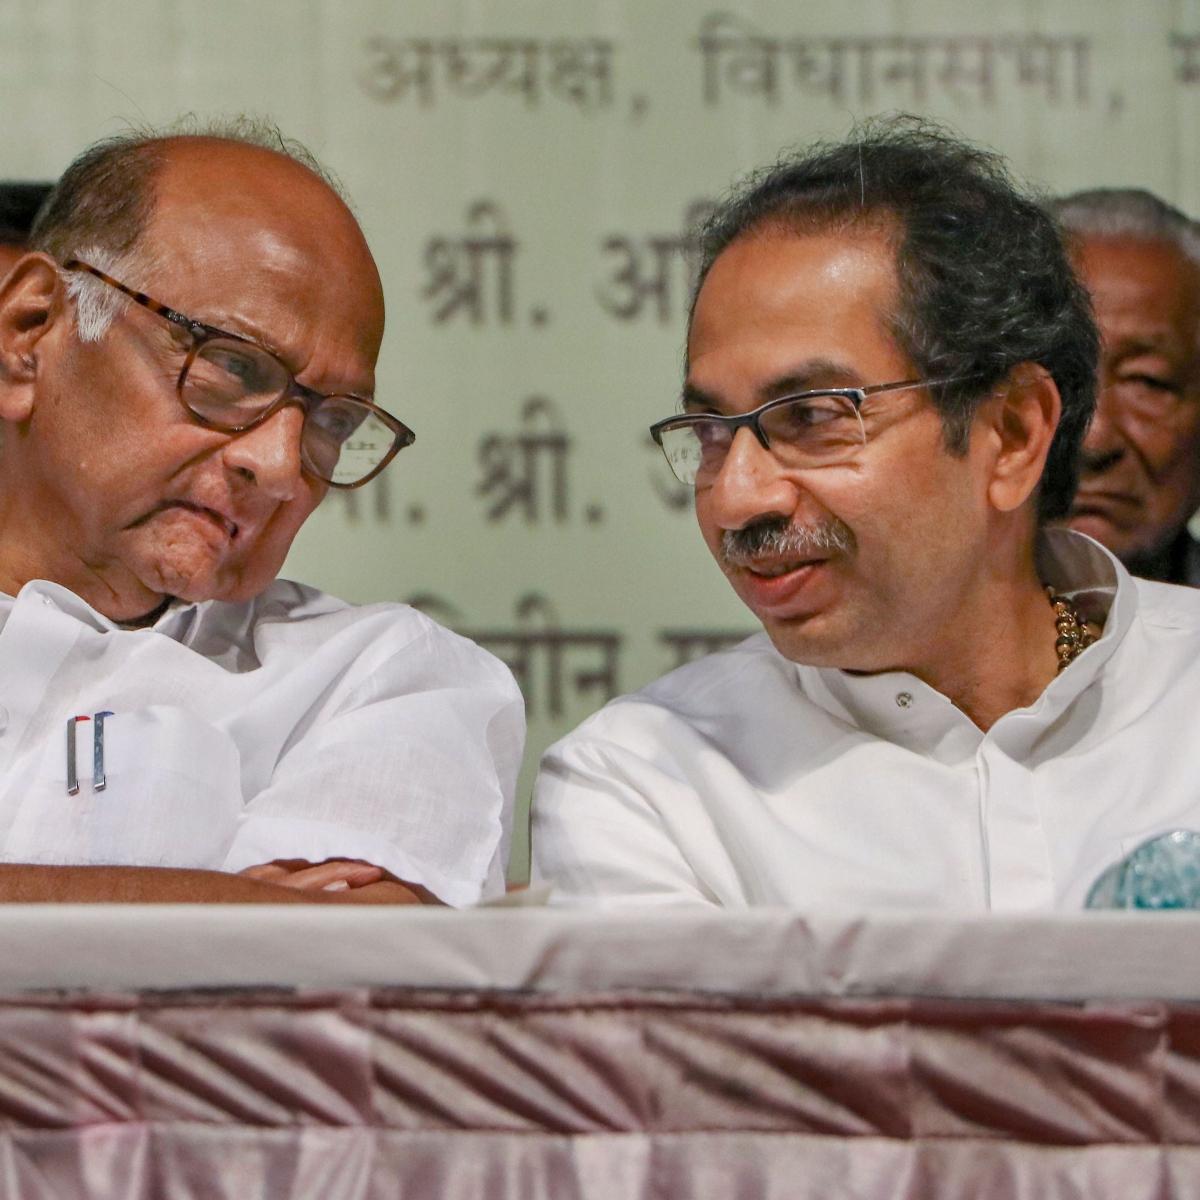 'Maharashtra's support is unfair': Sharad Pawar criticises Uddhav Thackeray govt over transfer of Bhima-Koregaon case